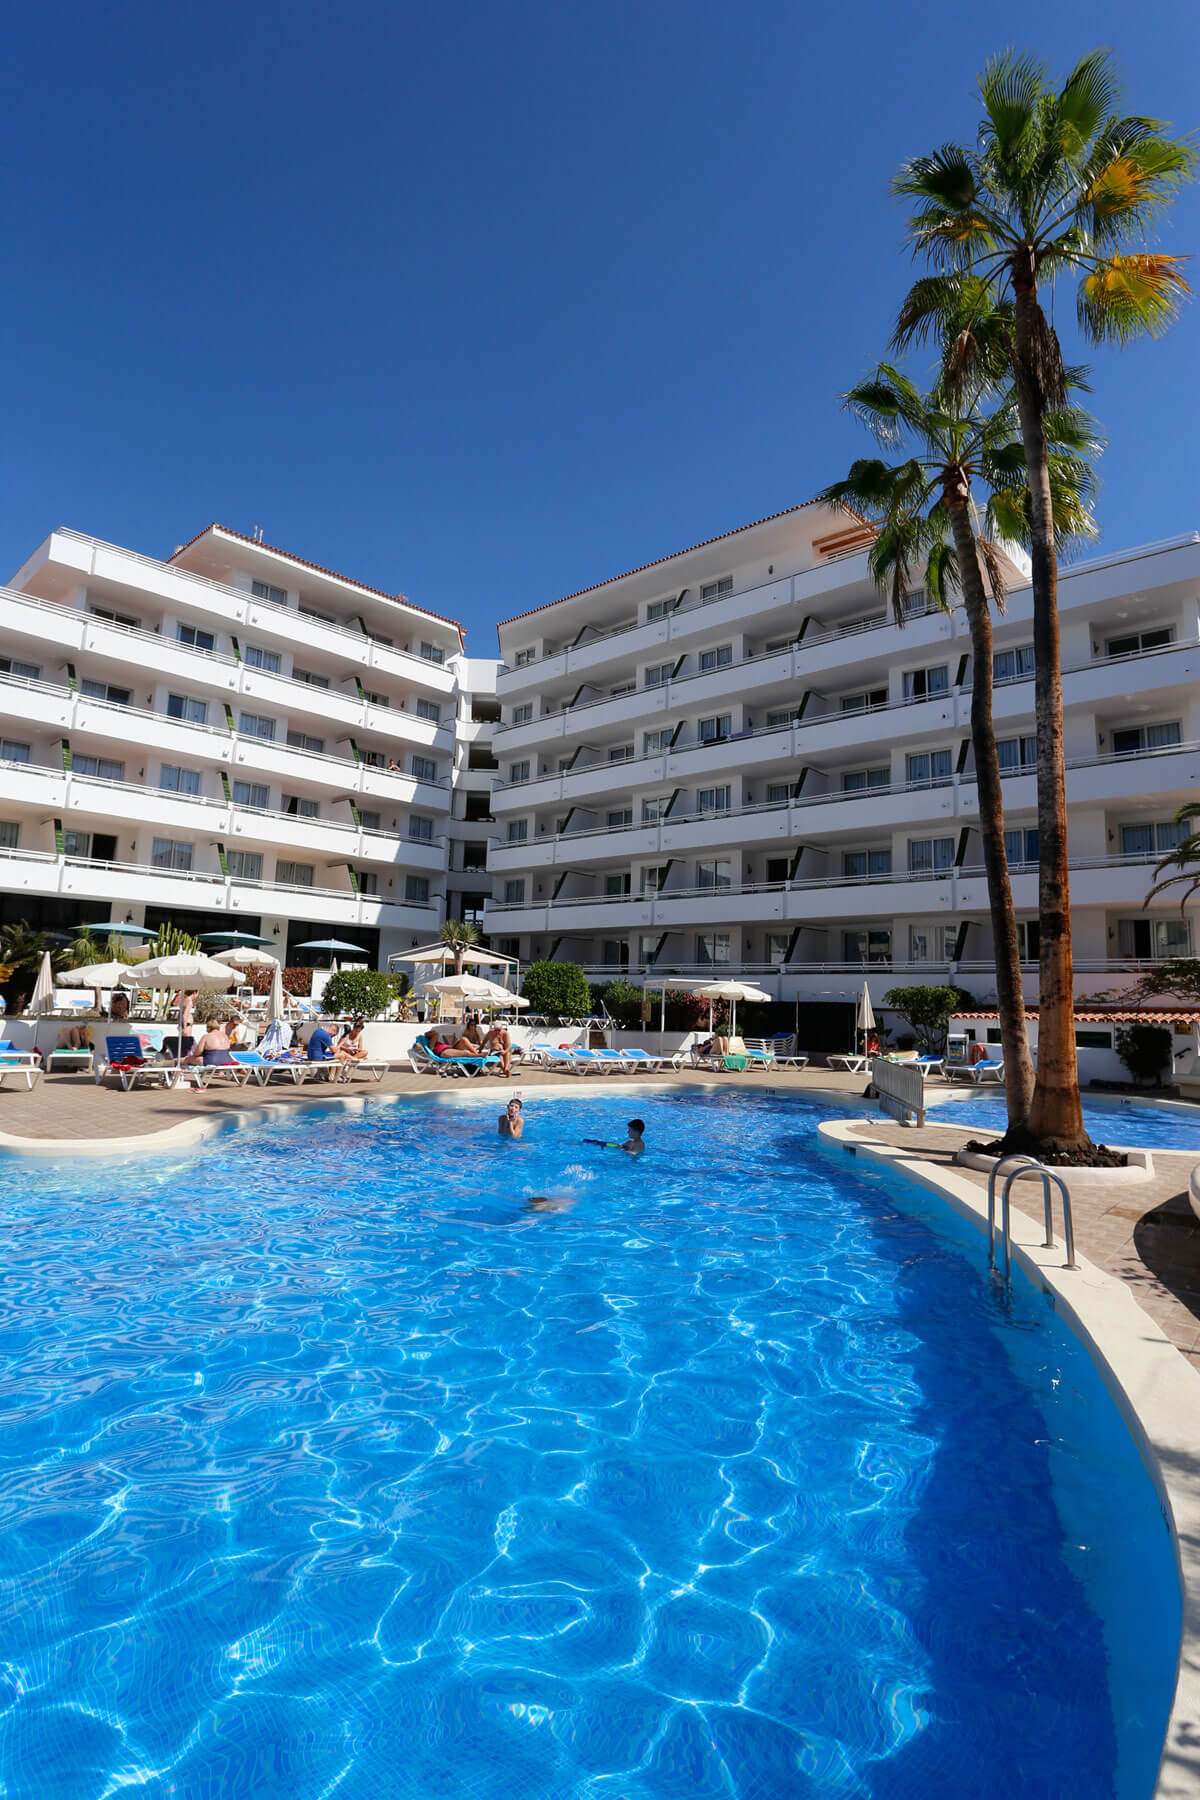 Hotel Andorra Tenerife Tripadvisor